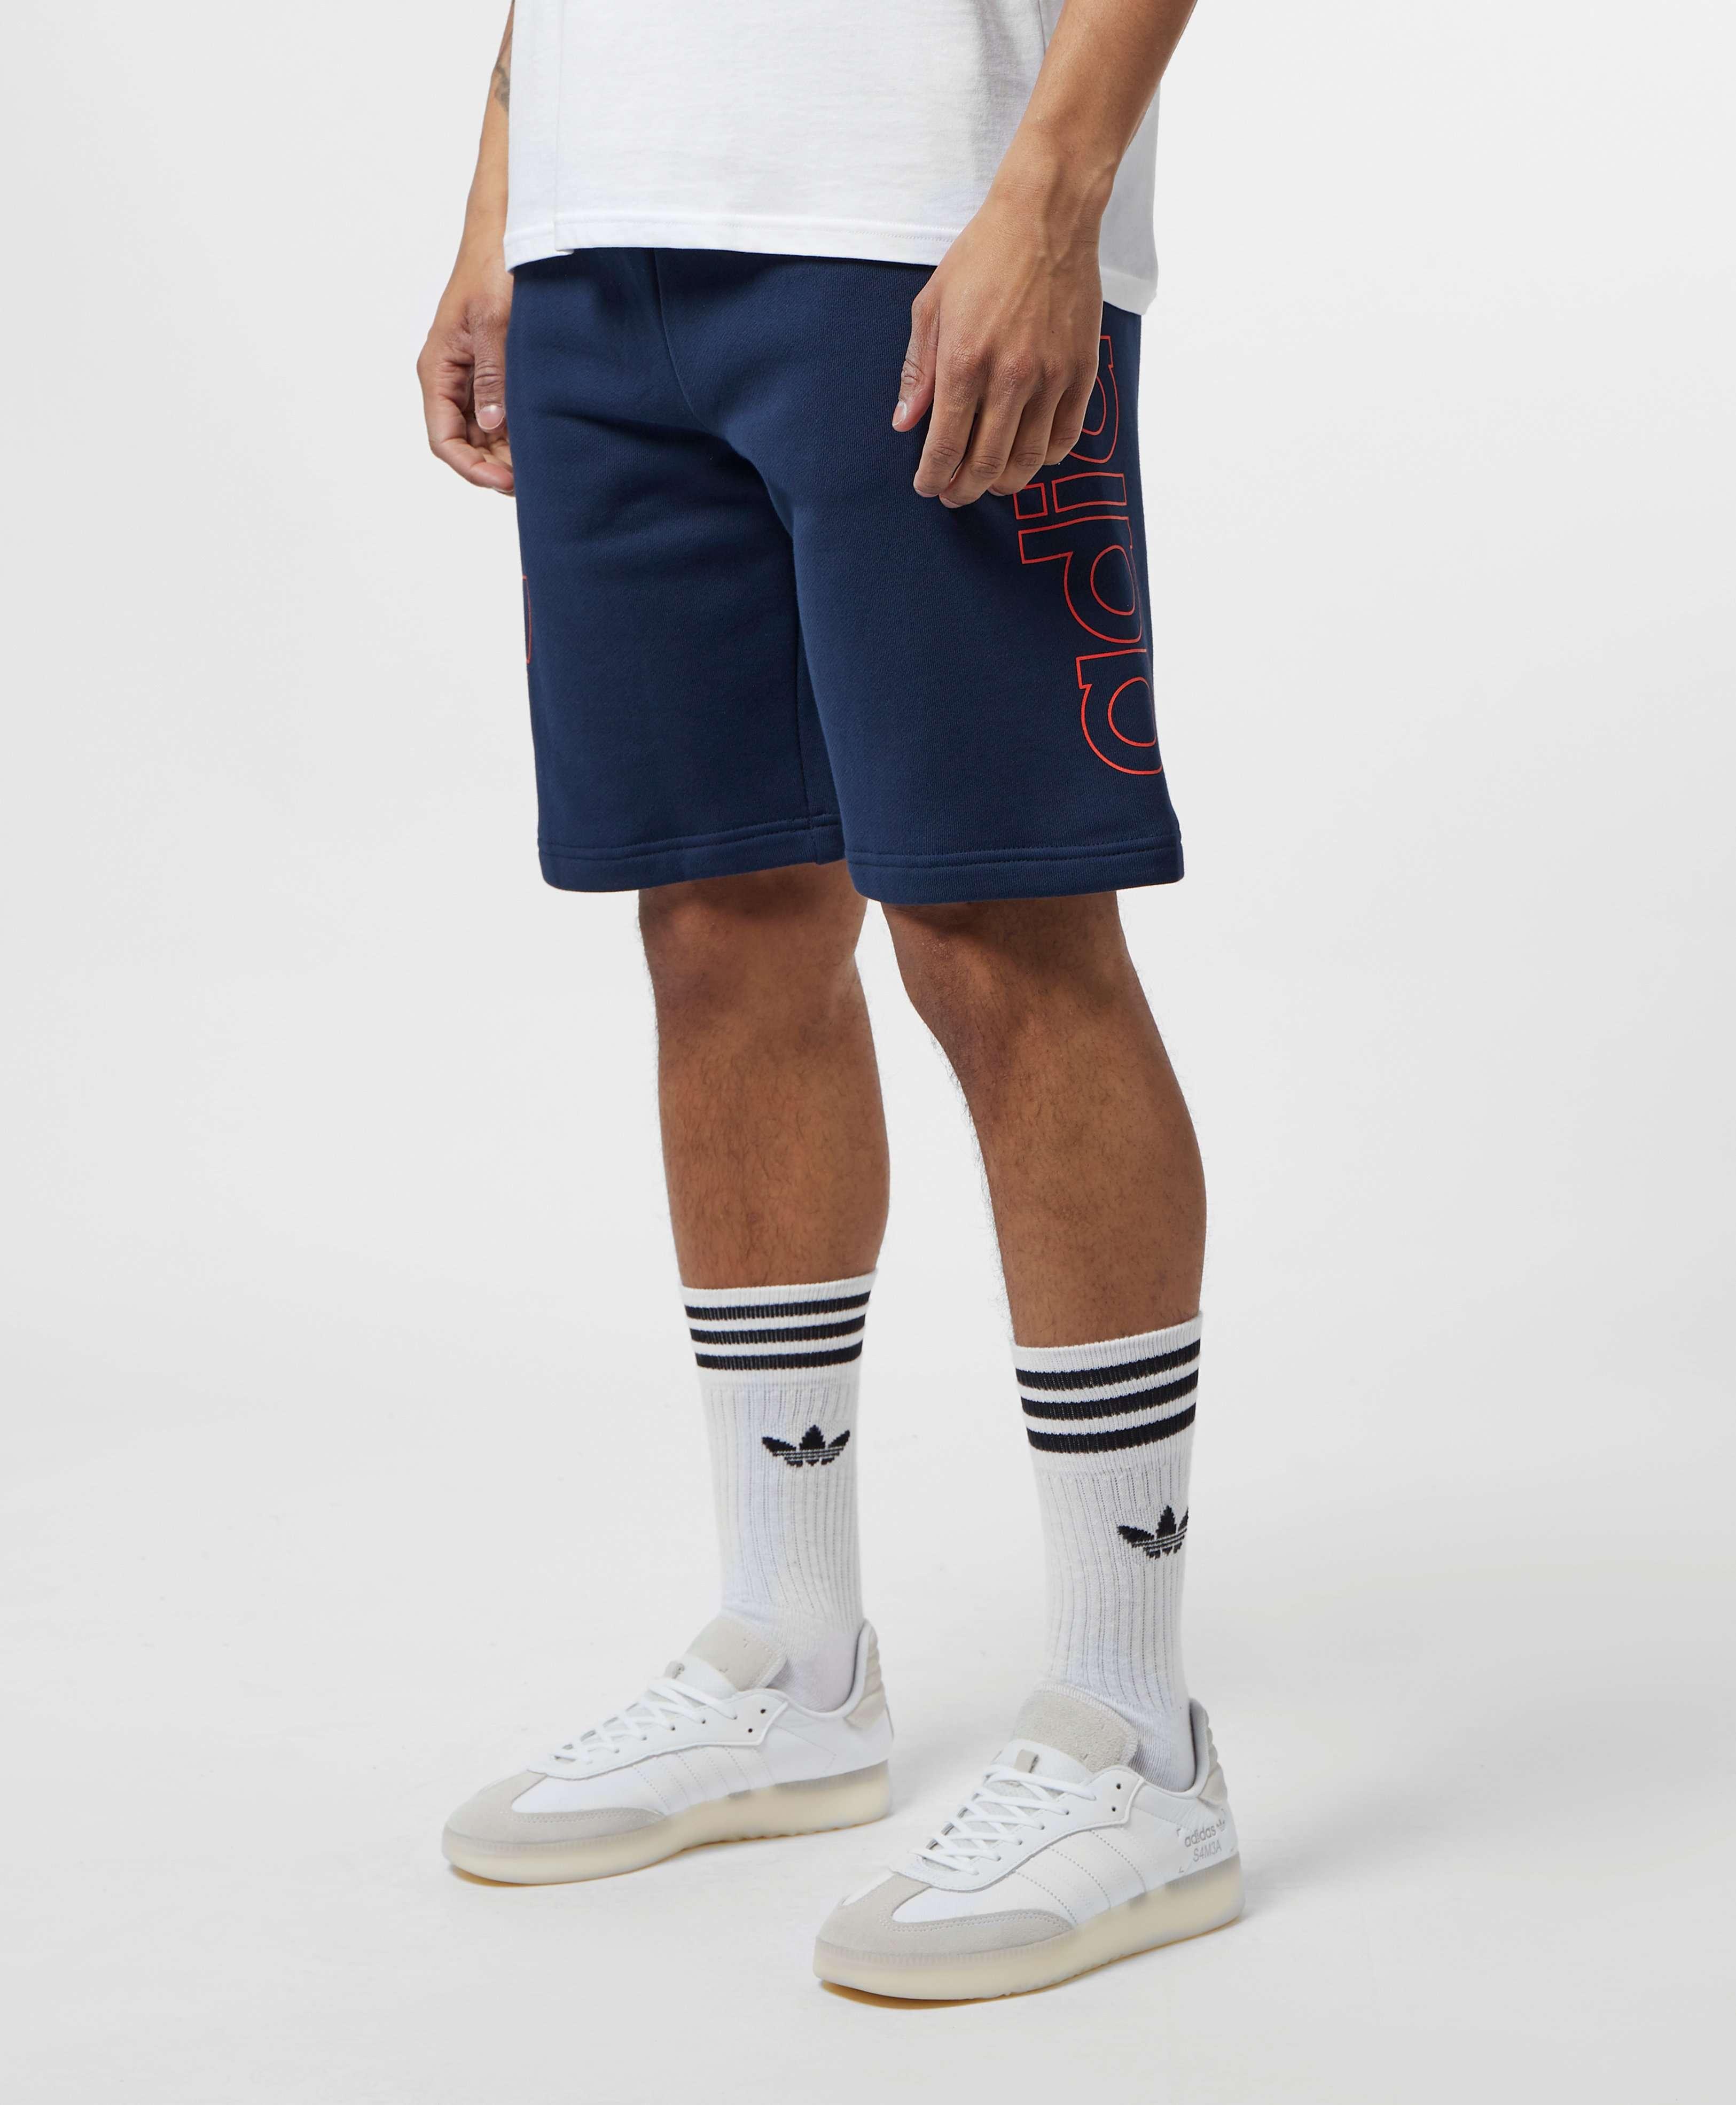 adidas Originals Spirit Dual Logo Fleece Shorts